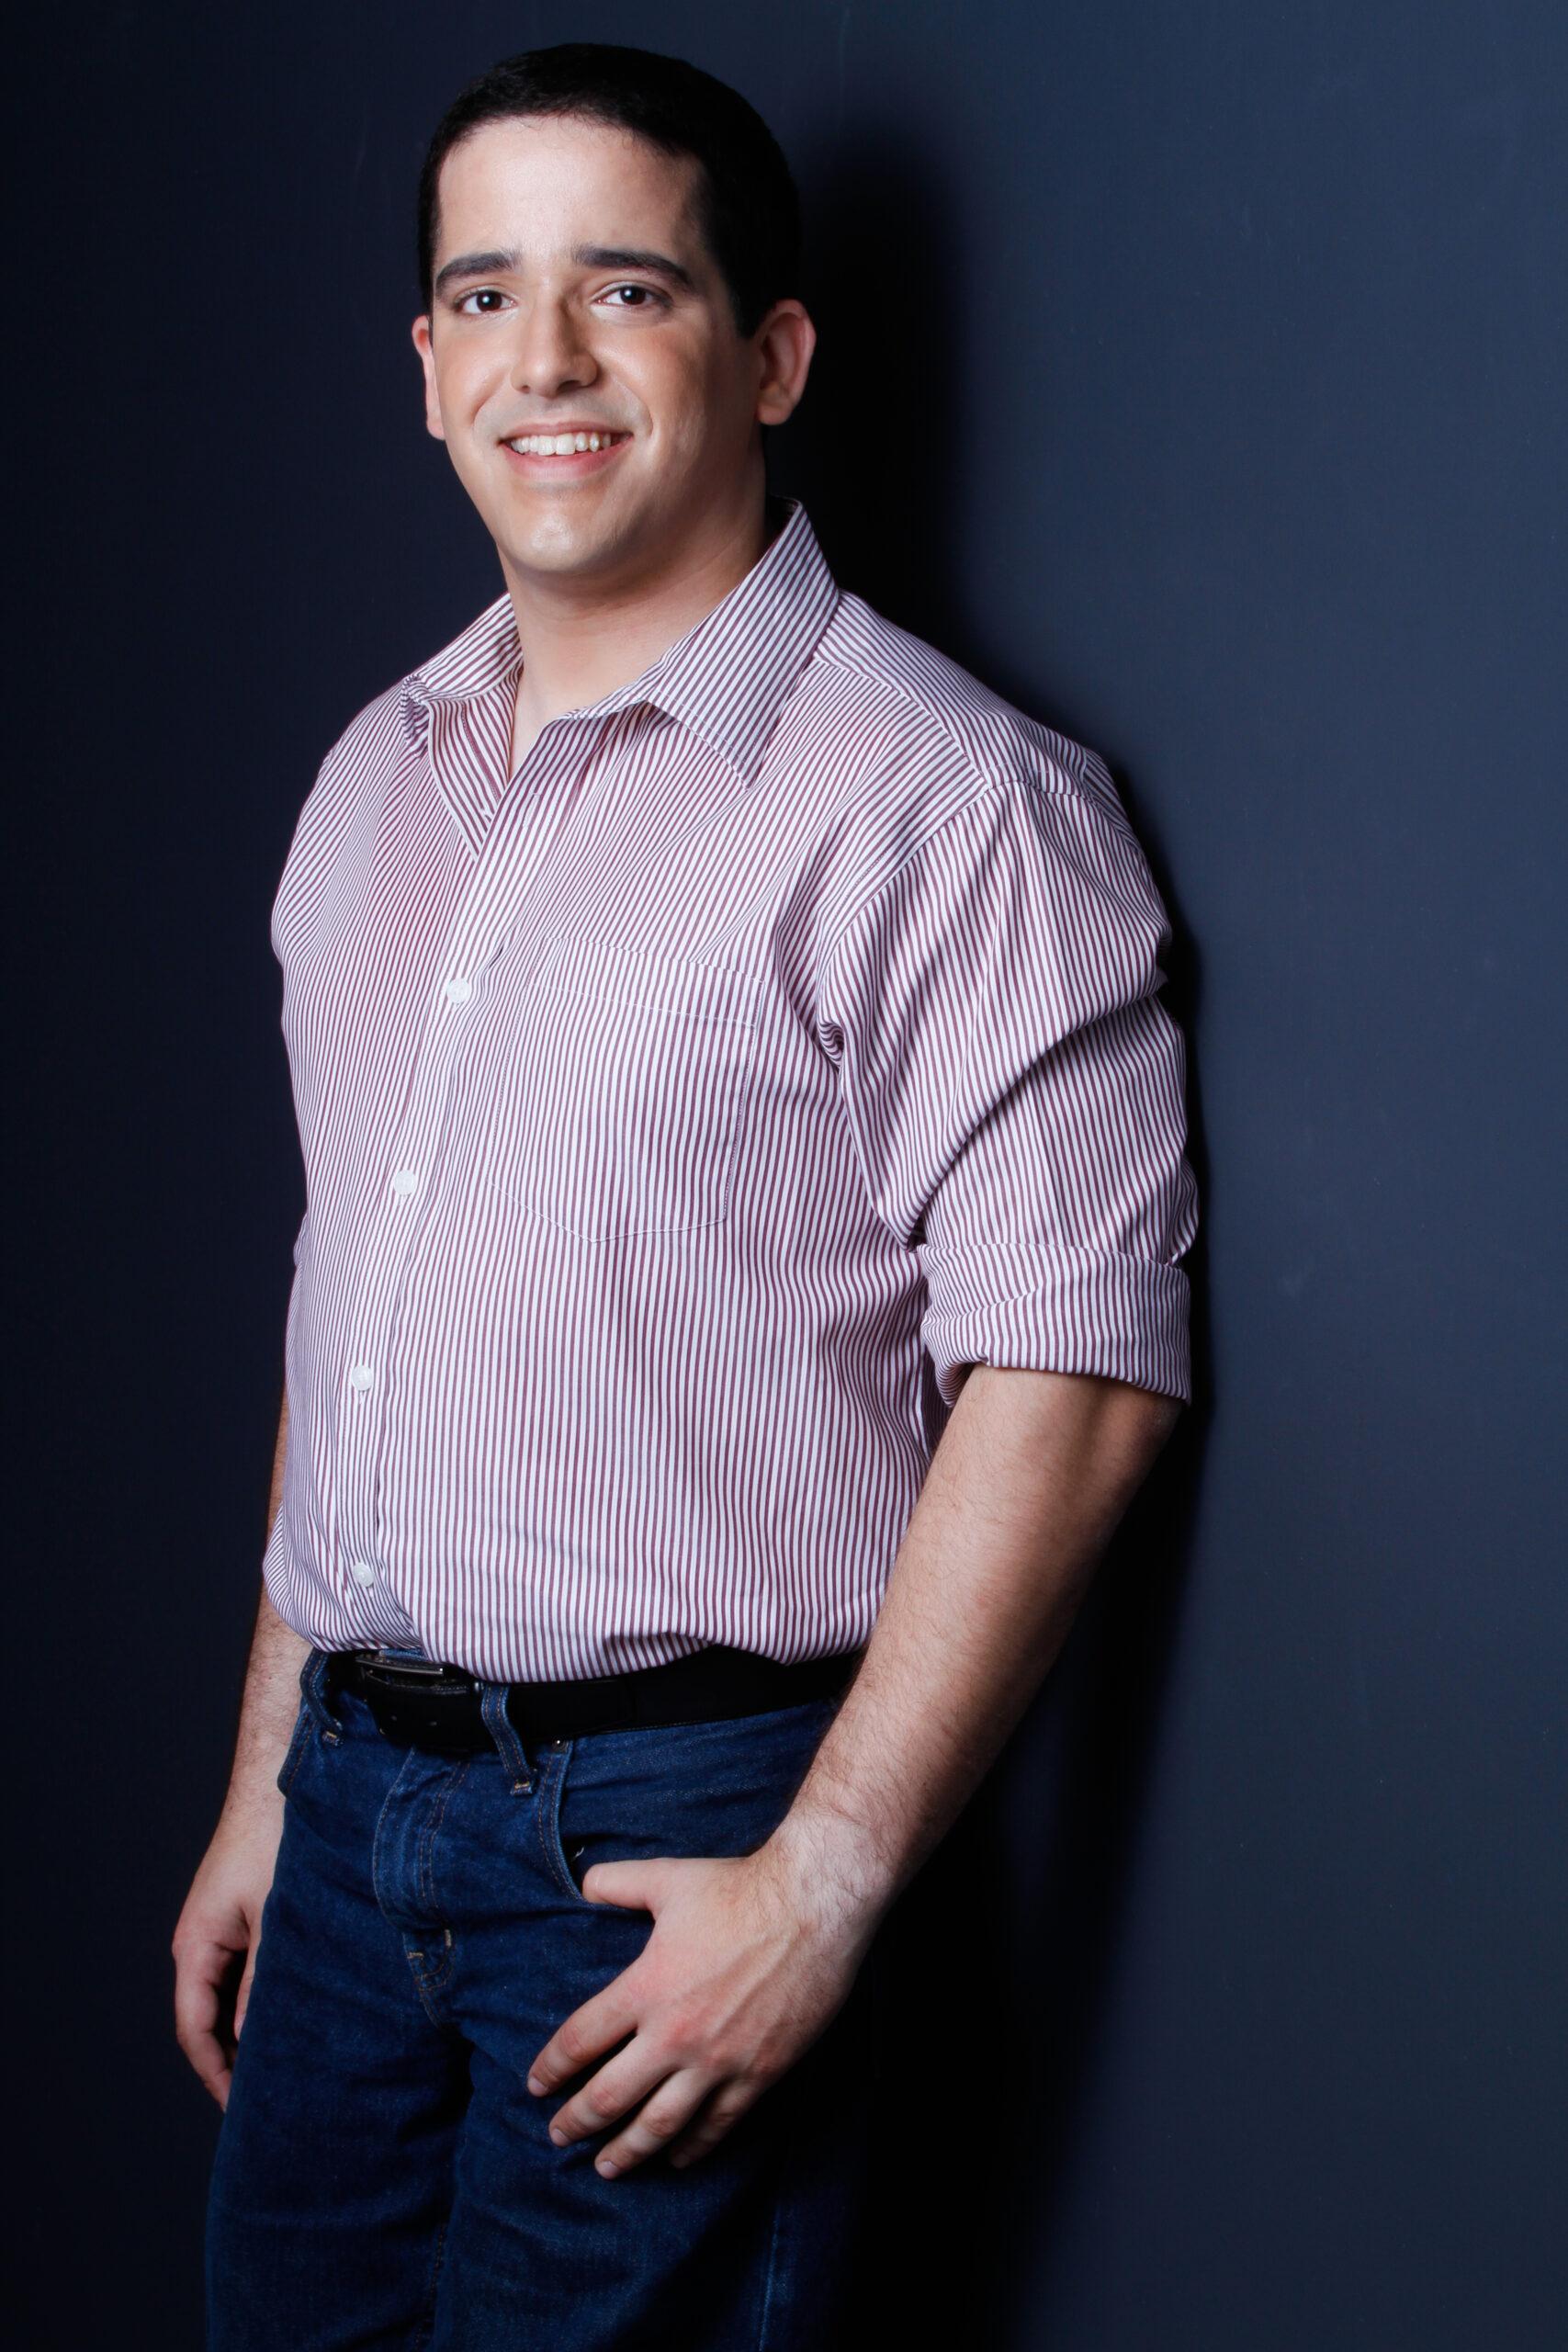 Heriberto Acosta-Maestre